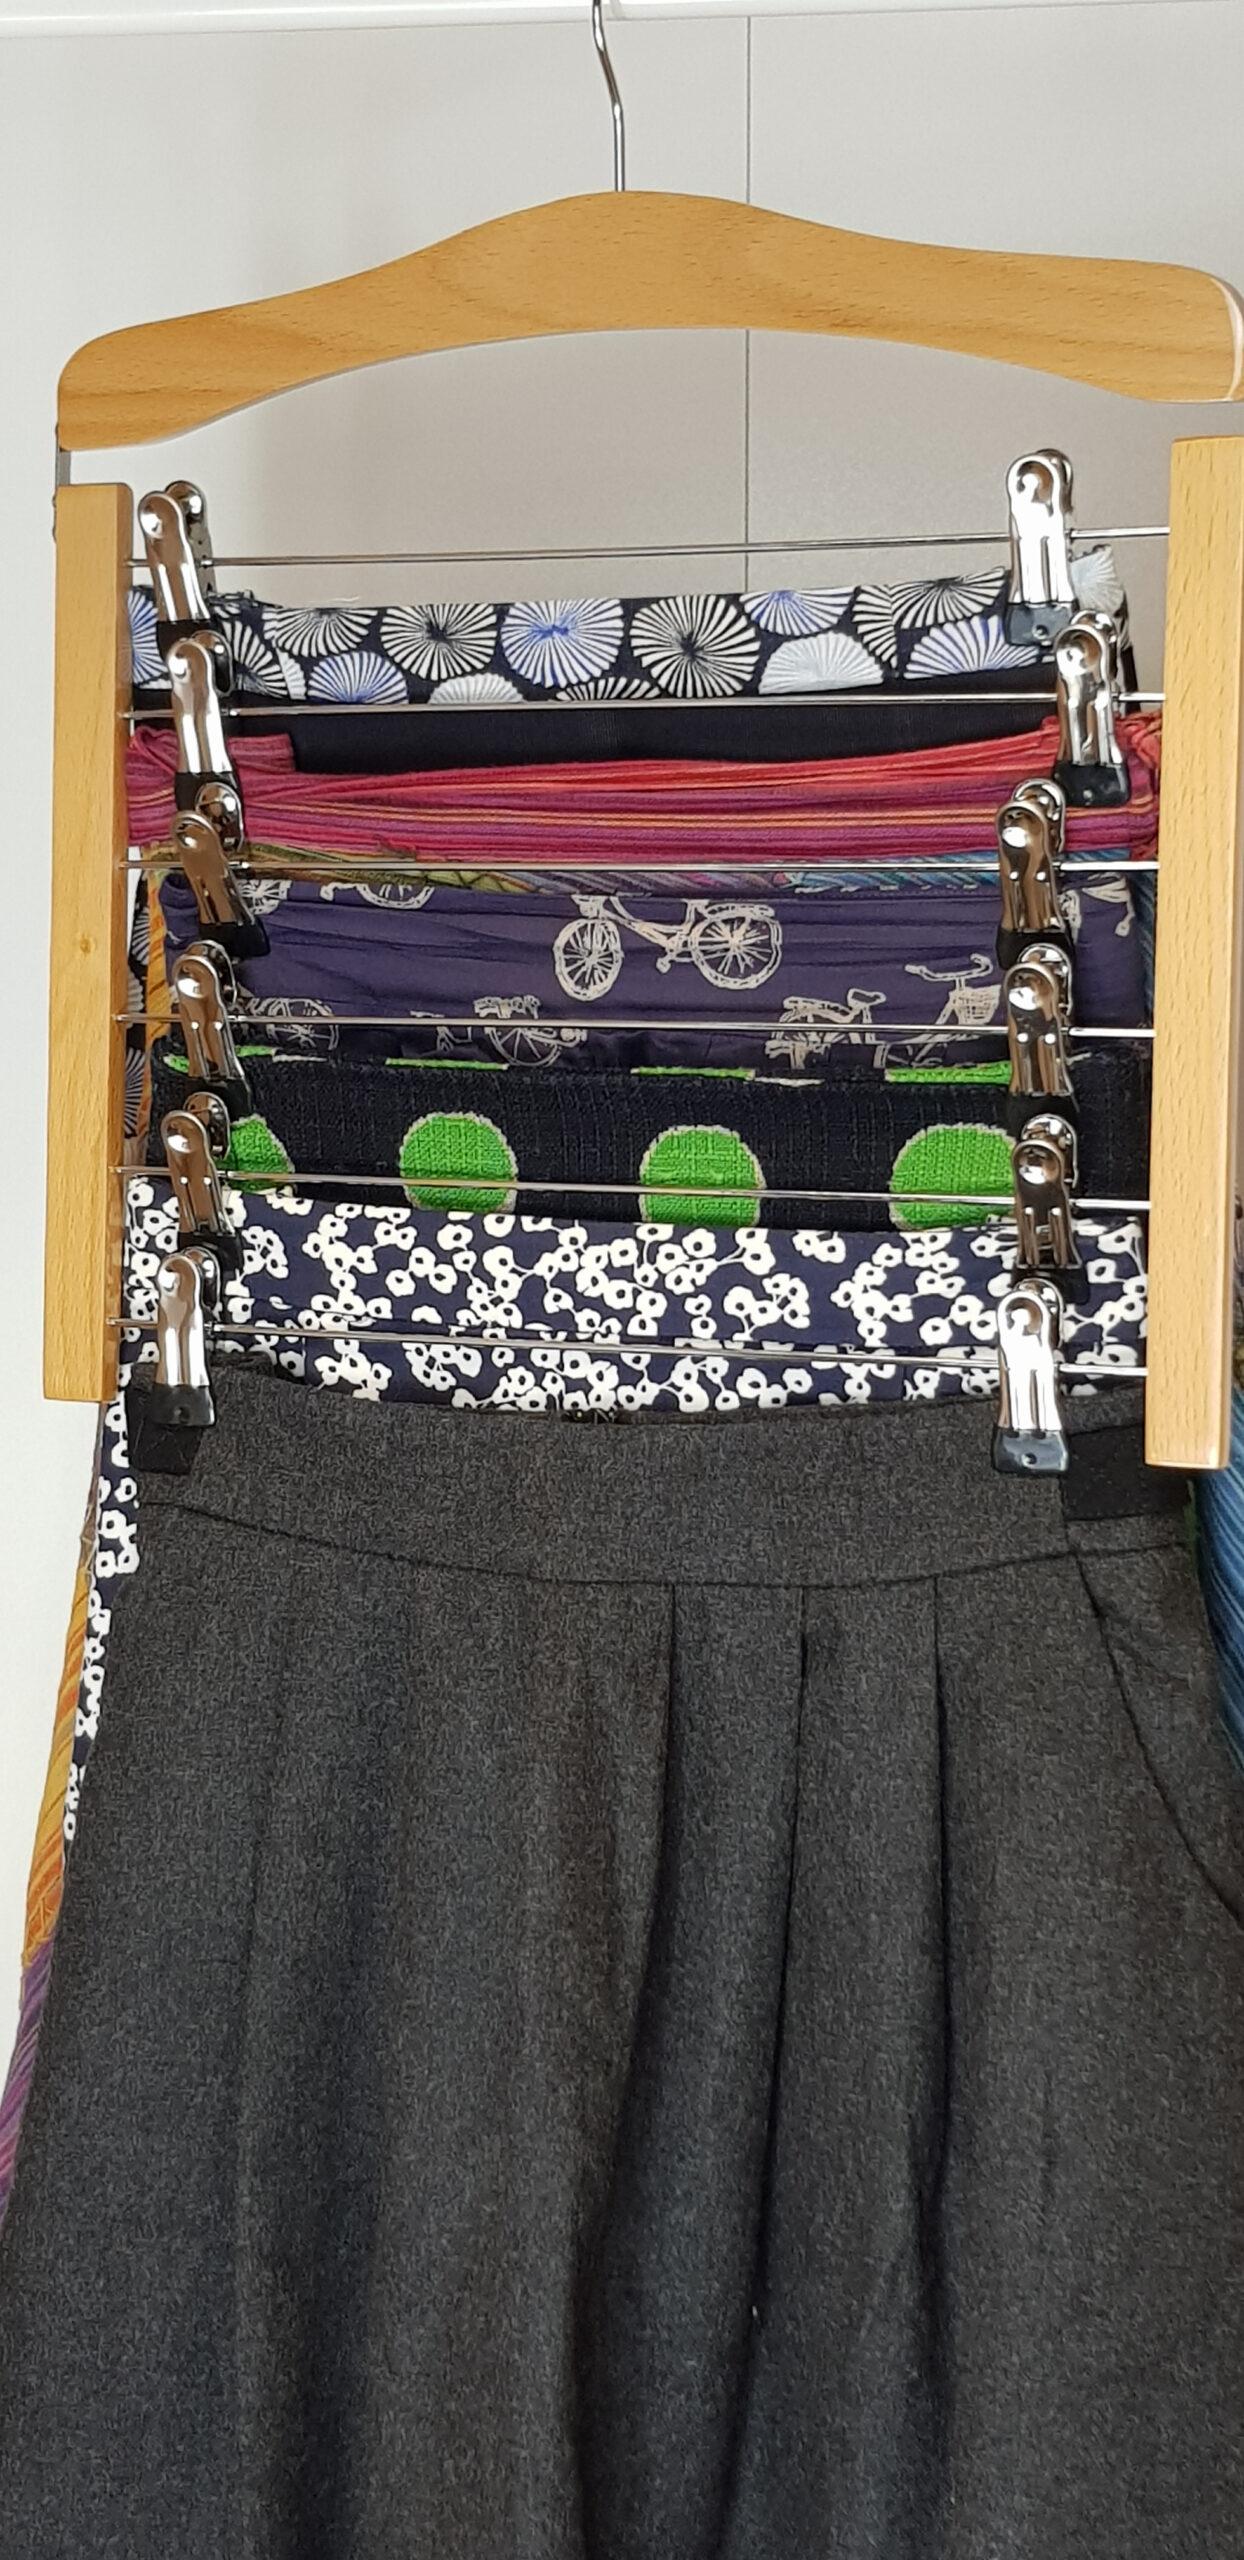 Space Saving Skirt Hanger, Heavy Duty, 6 Skirts Per Hanger, Beech Wood